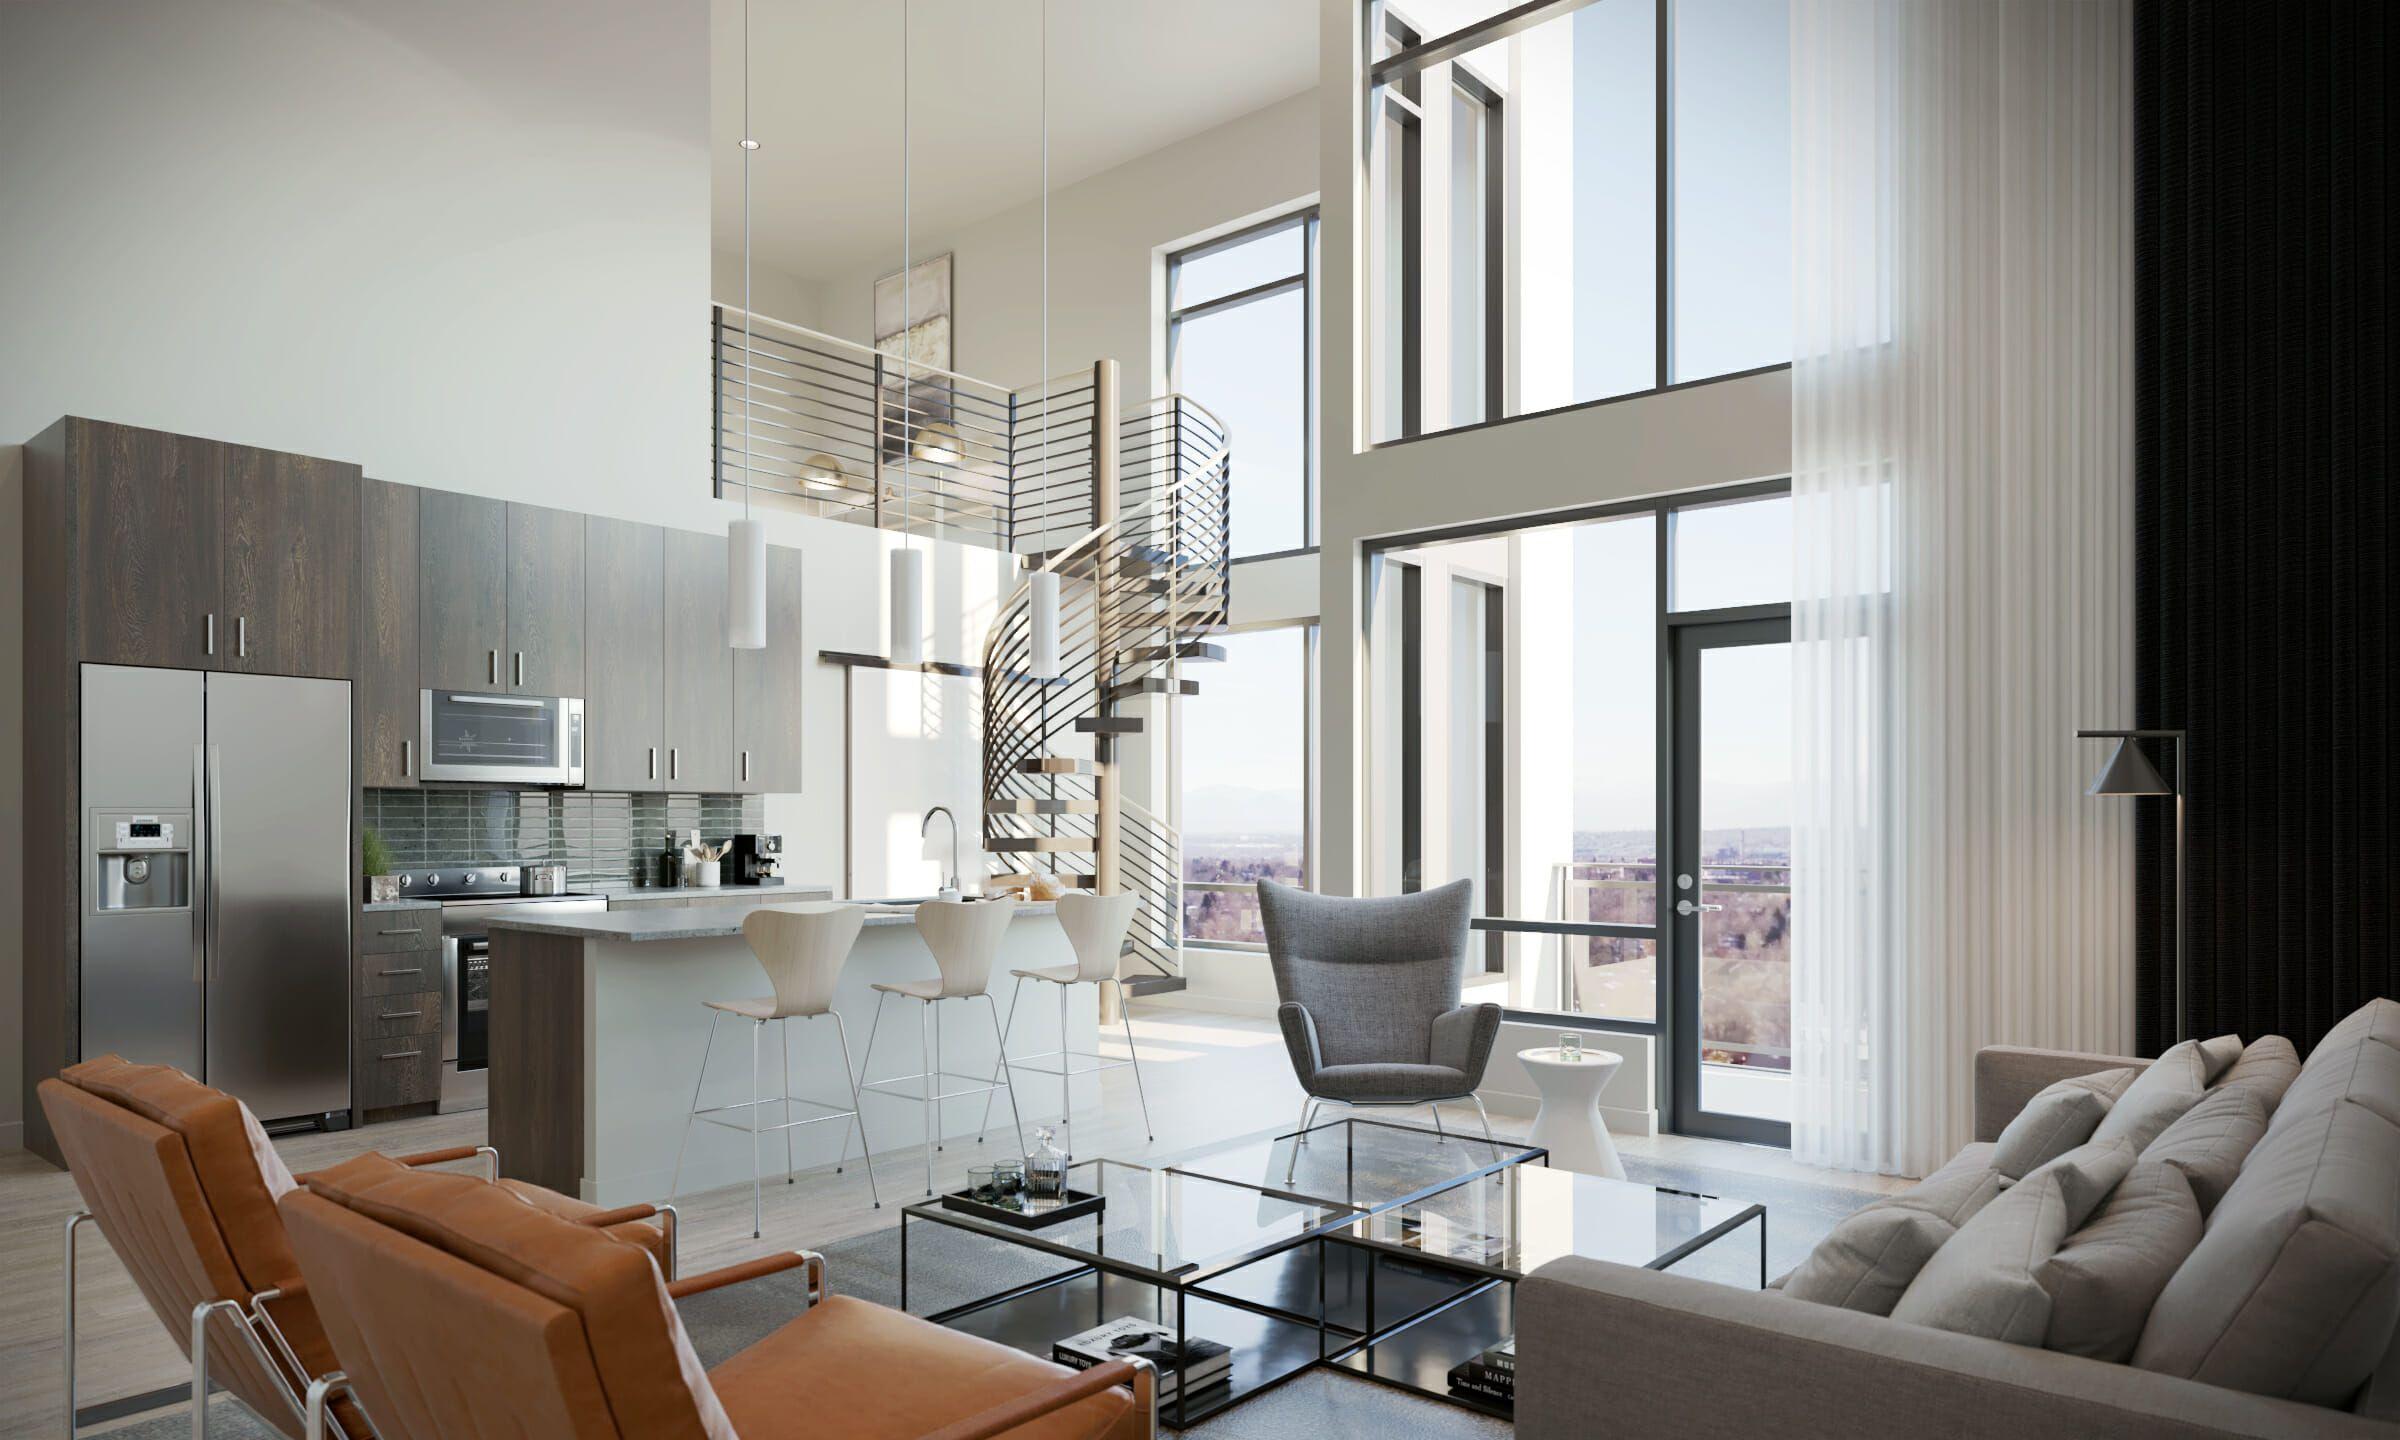 Top 10 Denver Interior Designers Dekoration Dekorationideen Hausdeko Hausdekoratio Kitchen Design Trends Interior Design Styles Modern Home Interior Design